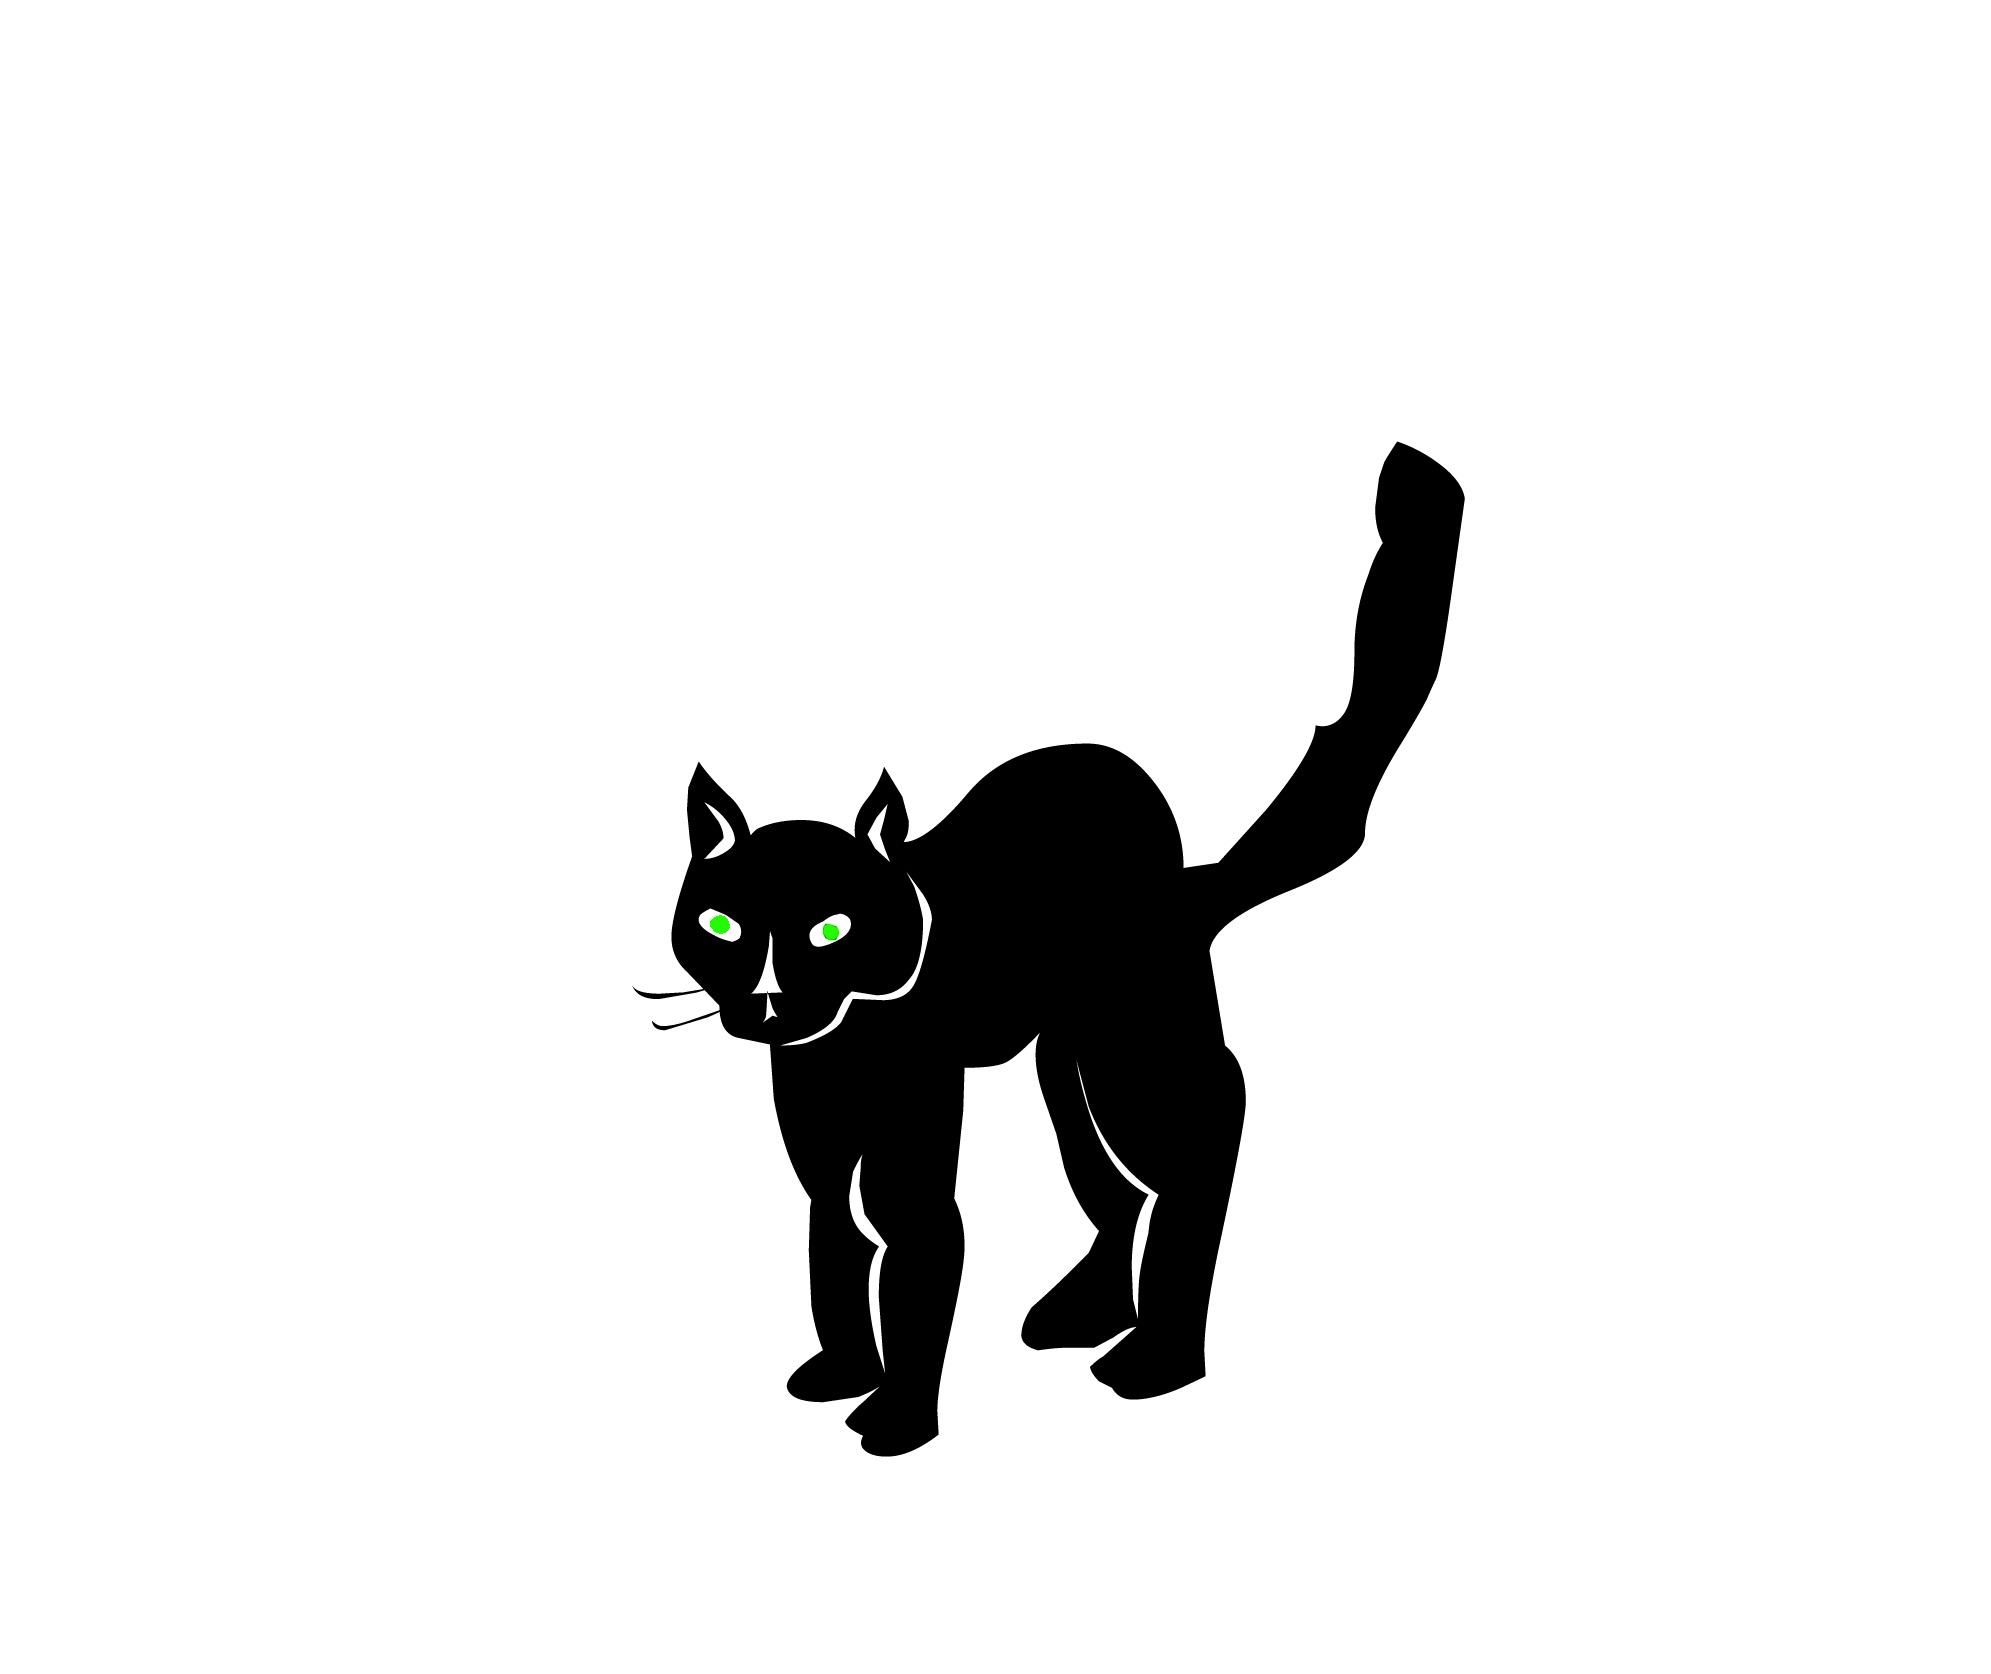 1991x1674 Image Of Clipart Black Cat Creepyhalloweenimages